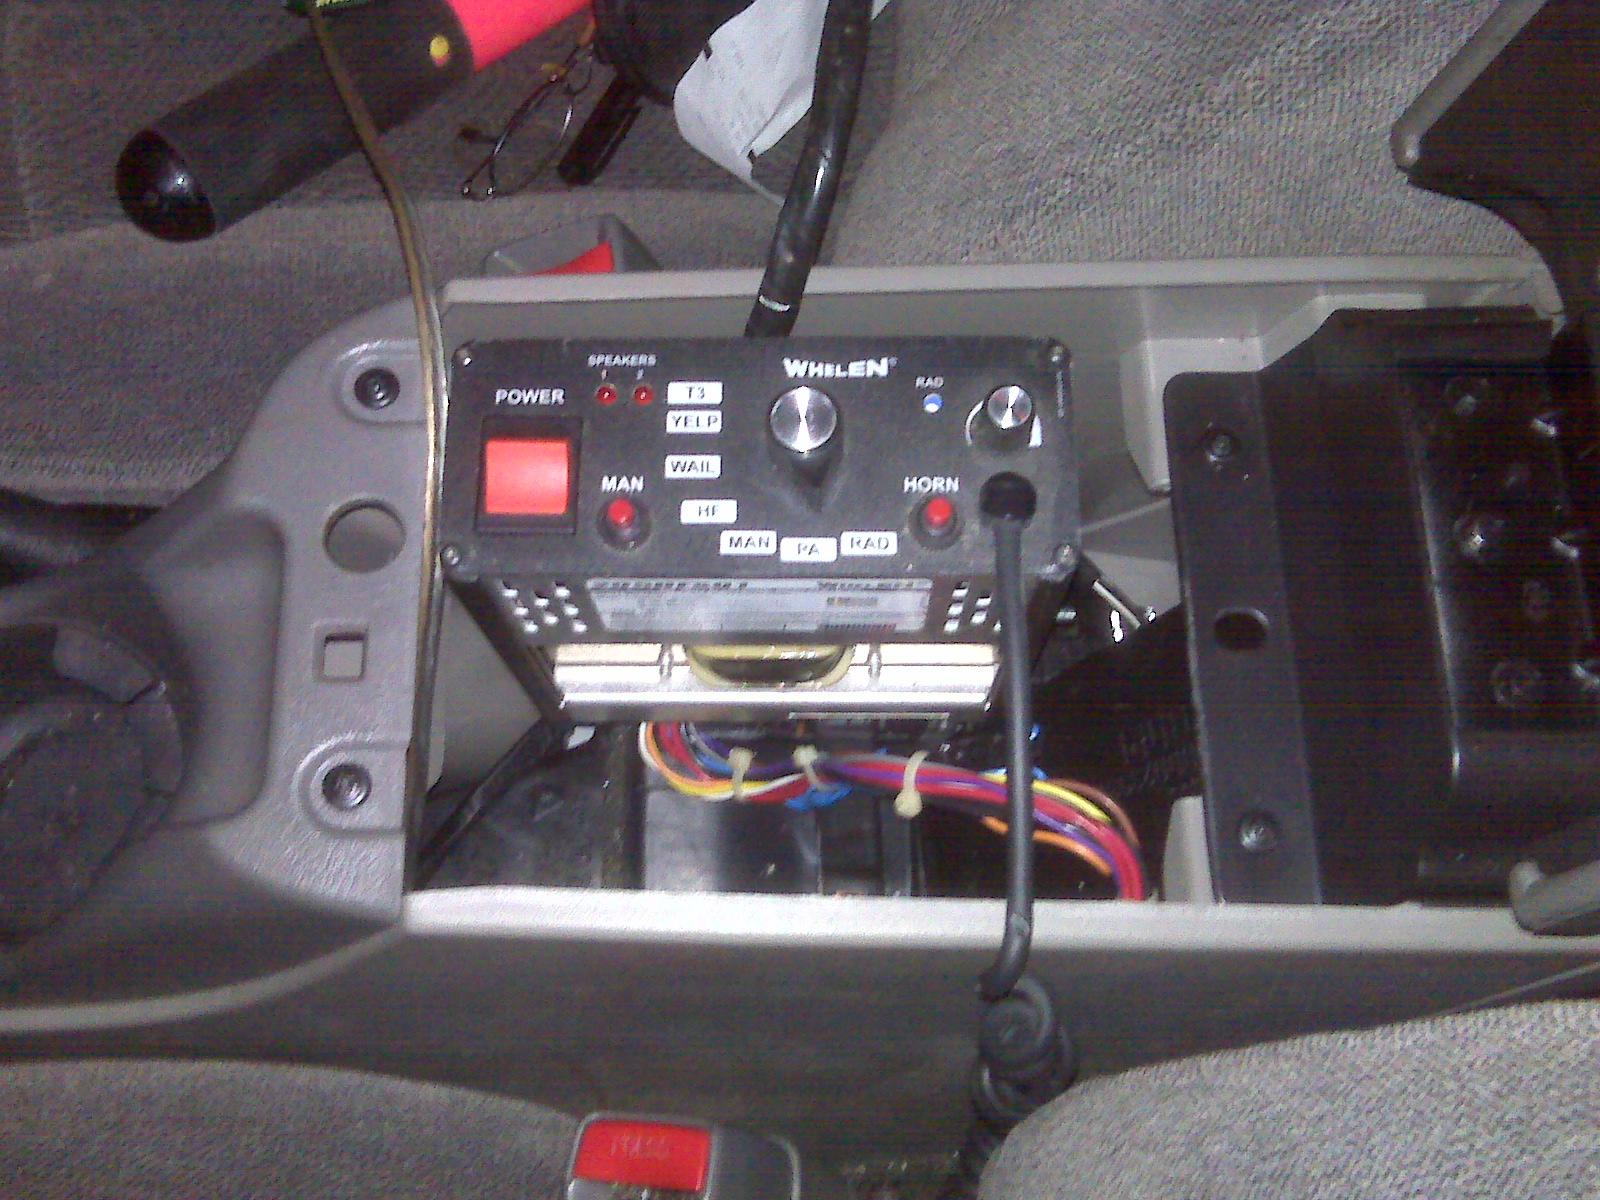 Whelen 295hfsa1 Wiring Diagram Hfsa Smart Led 500 Ams Siren Image Php Diagrams